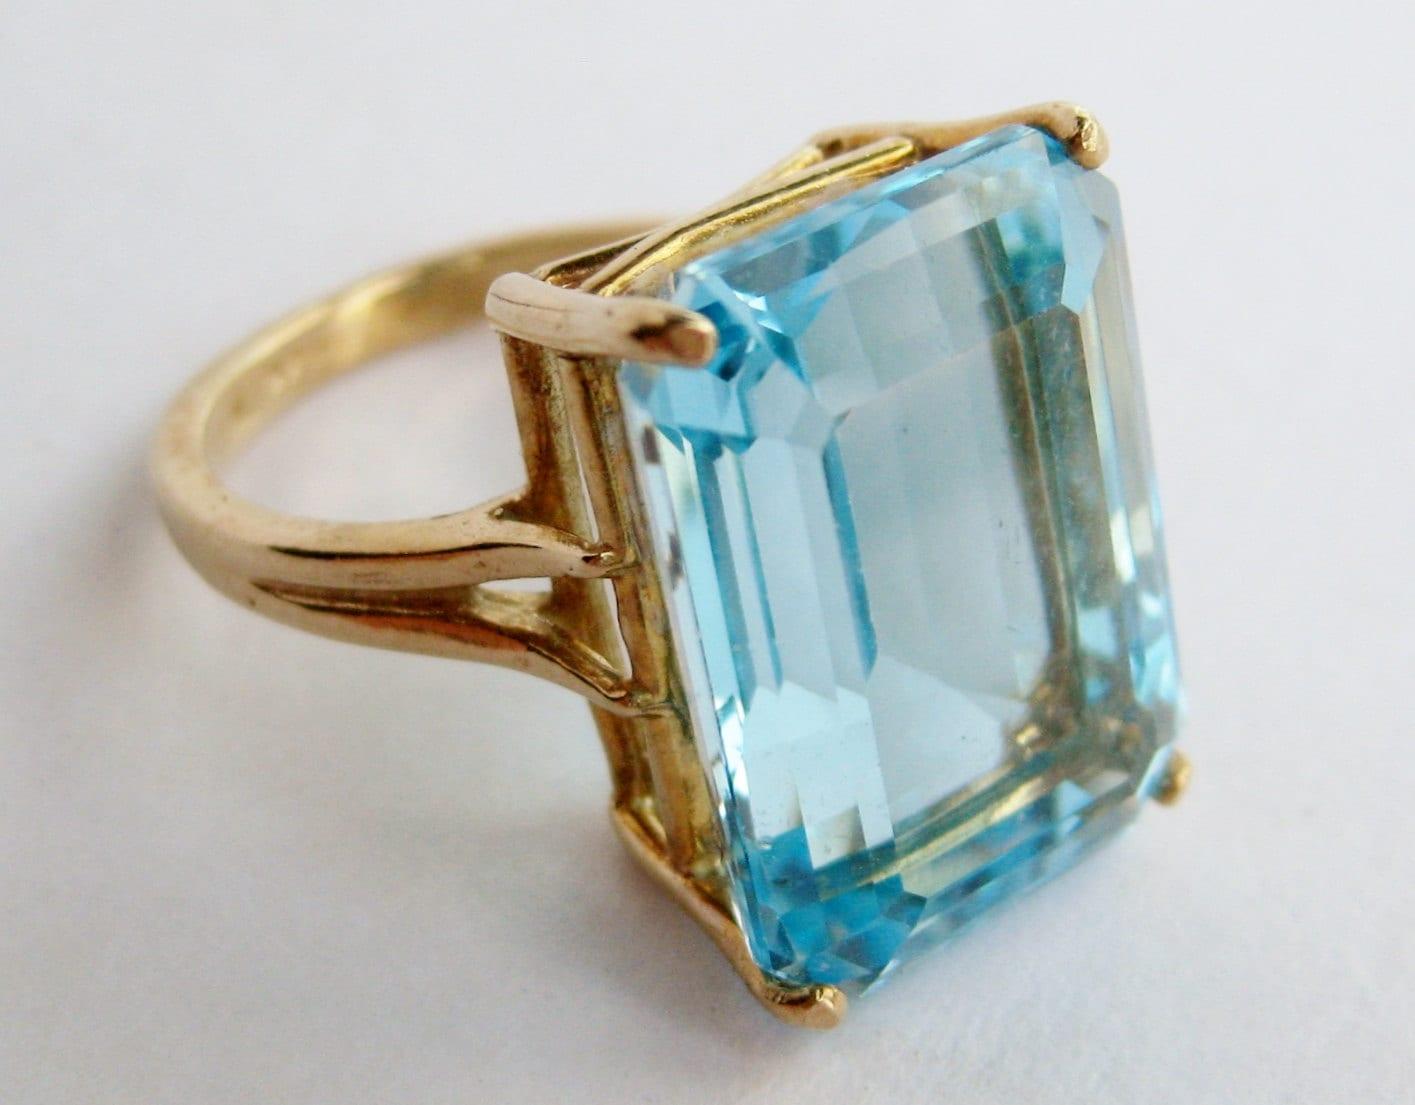 Vintage Fine 14k Gold Amp Emerald Cut Aquamarine Blue Jeweled